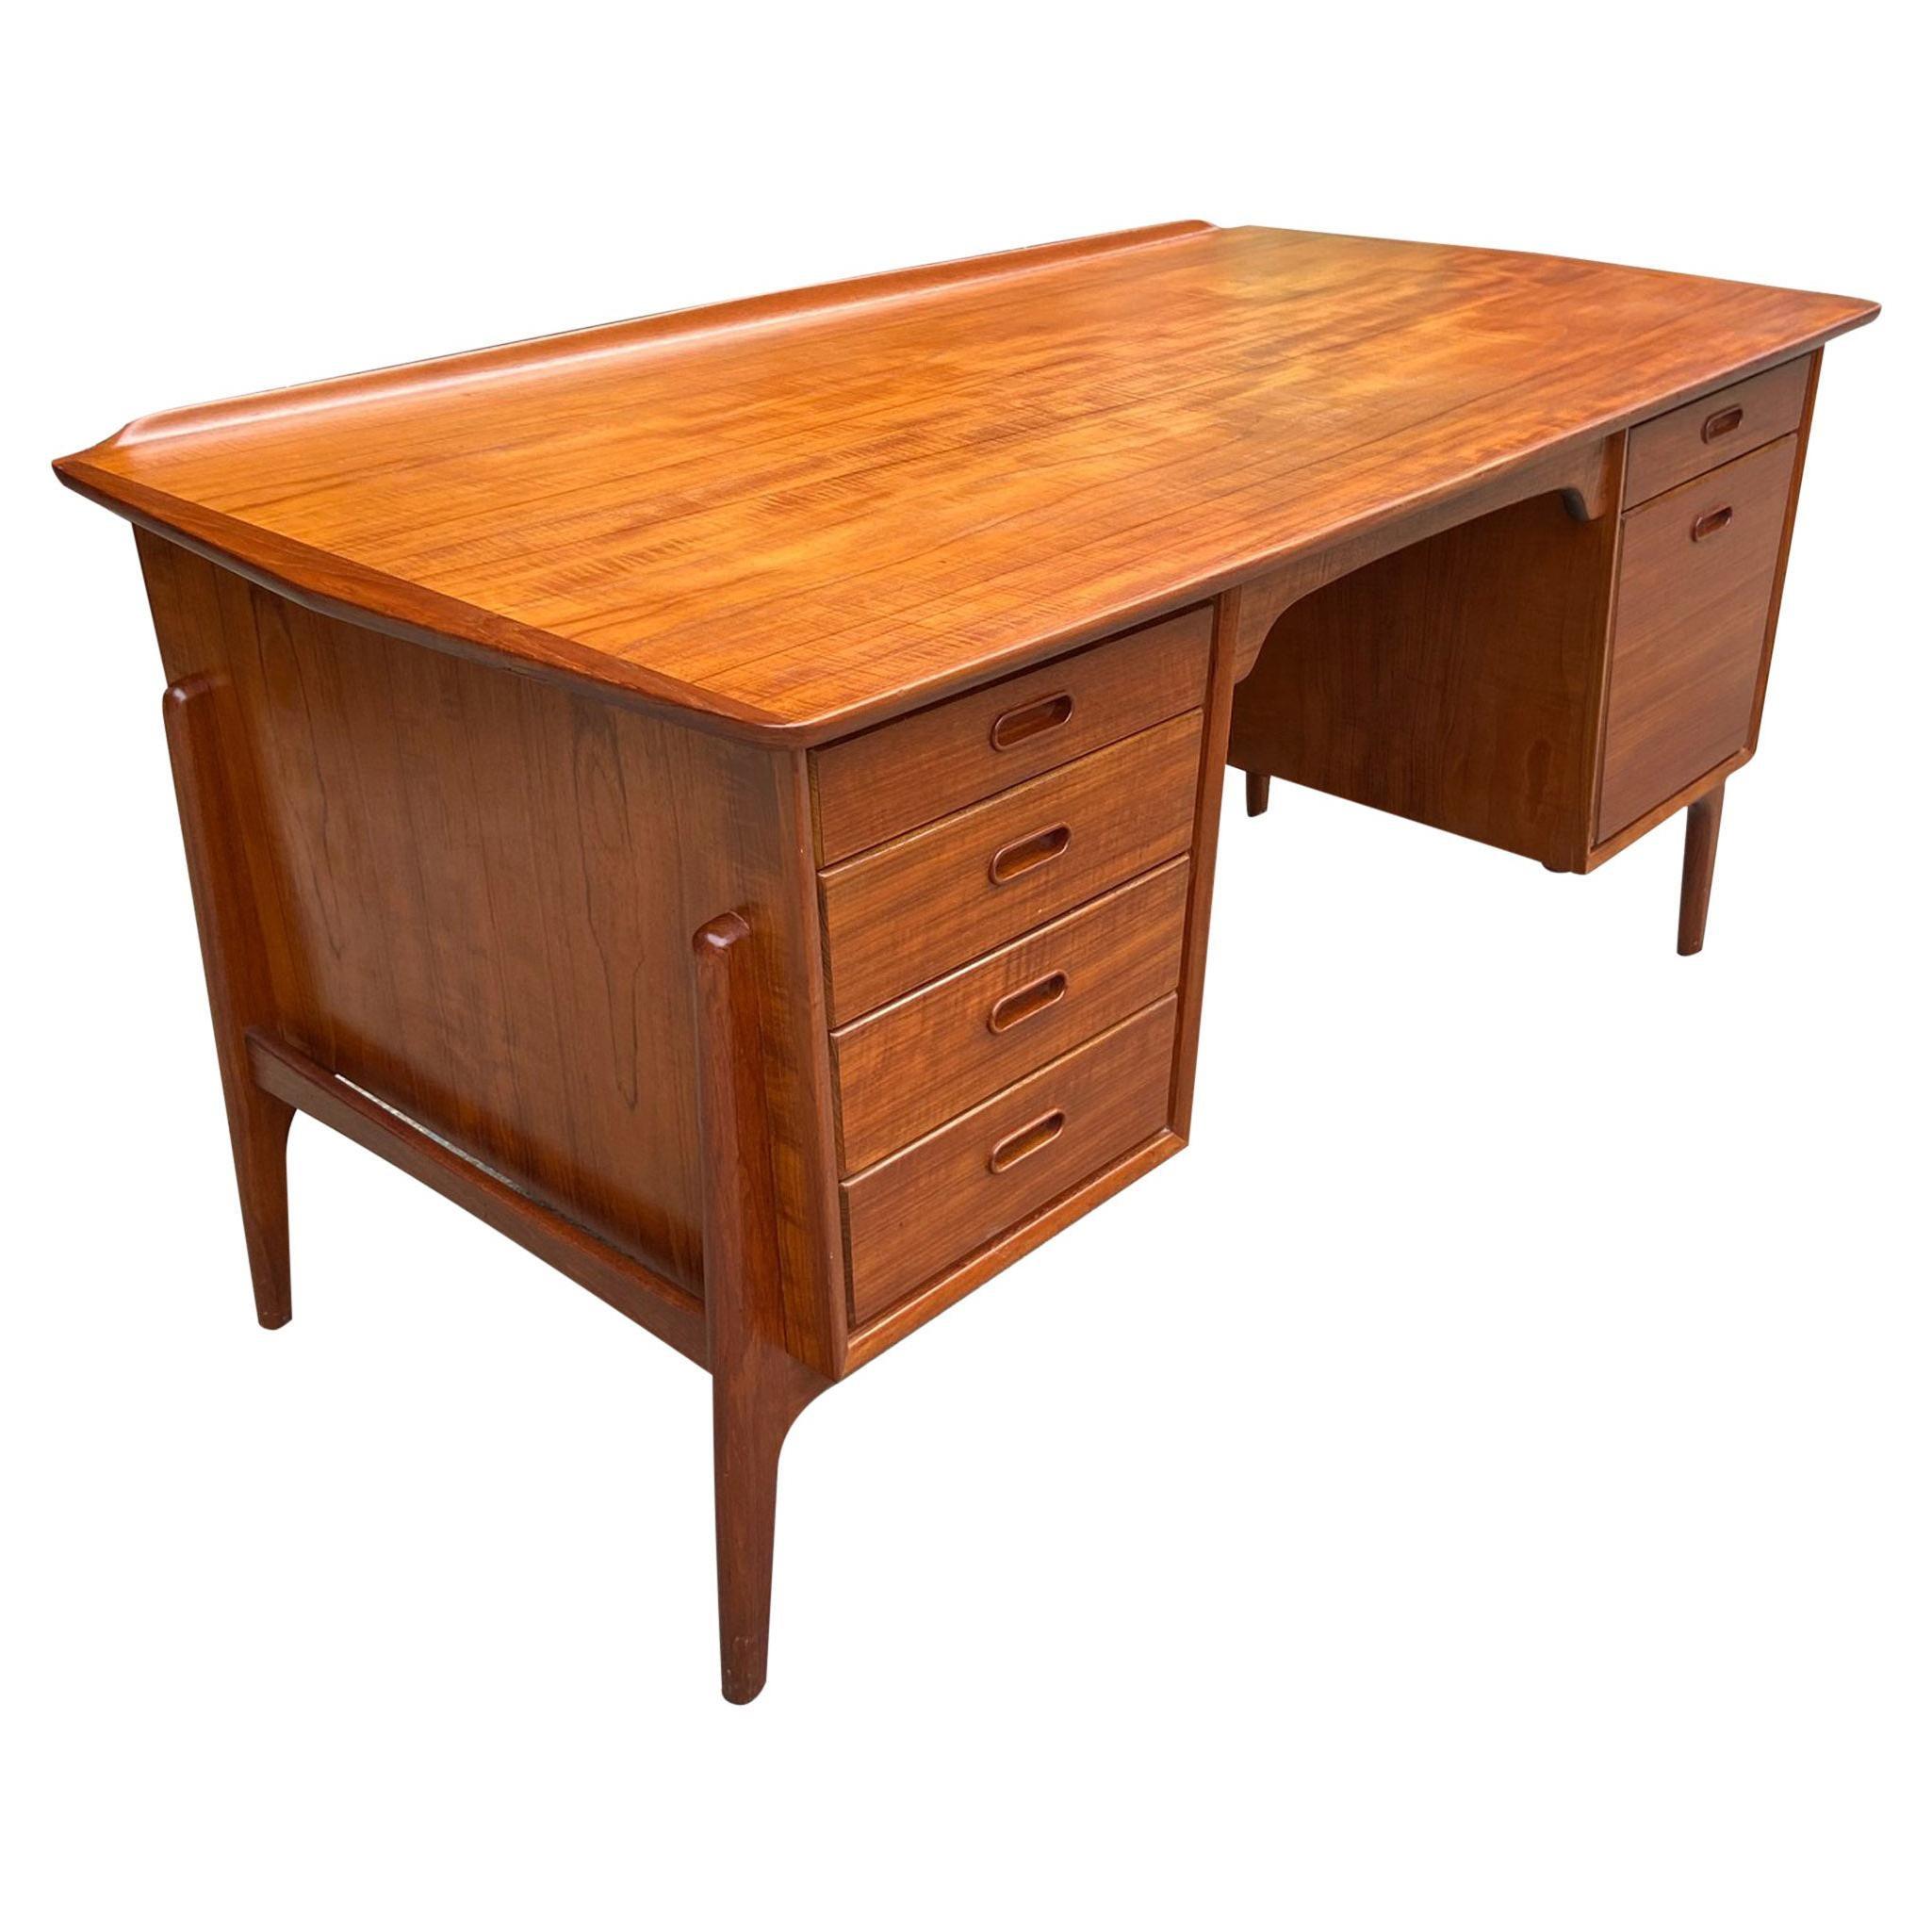 Mid-Century Modern Teak Desk Designed by Svend Aage Madsen